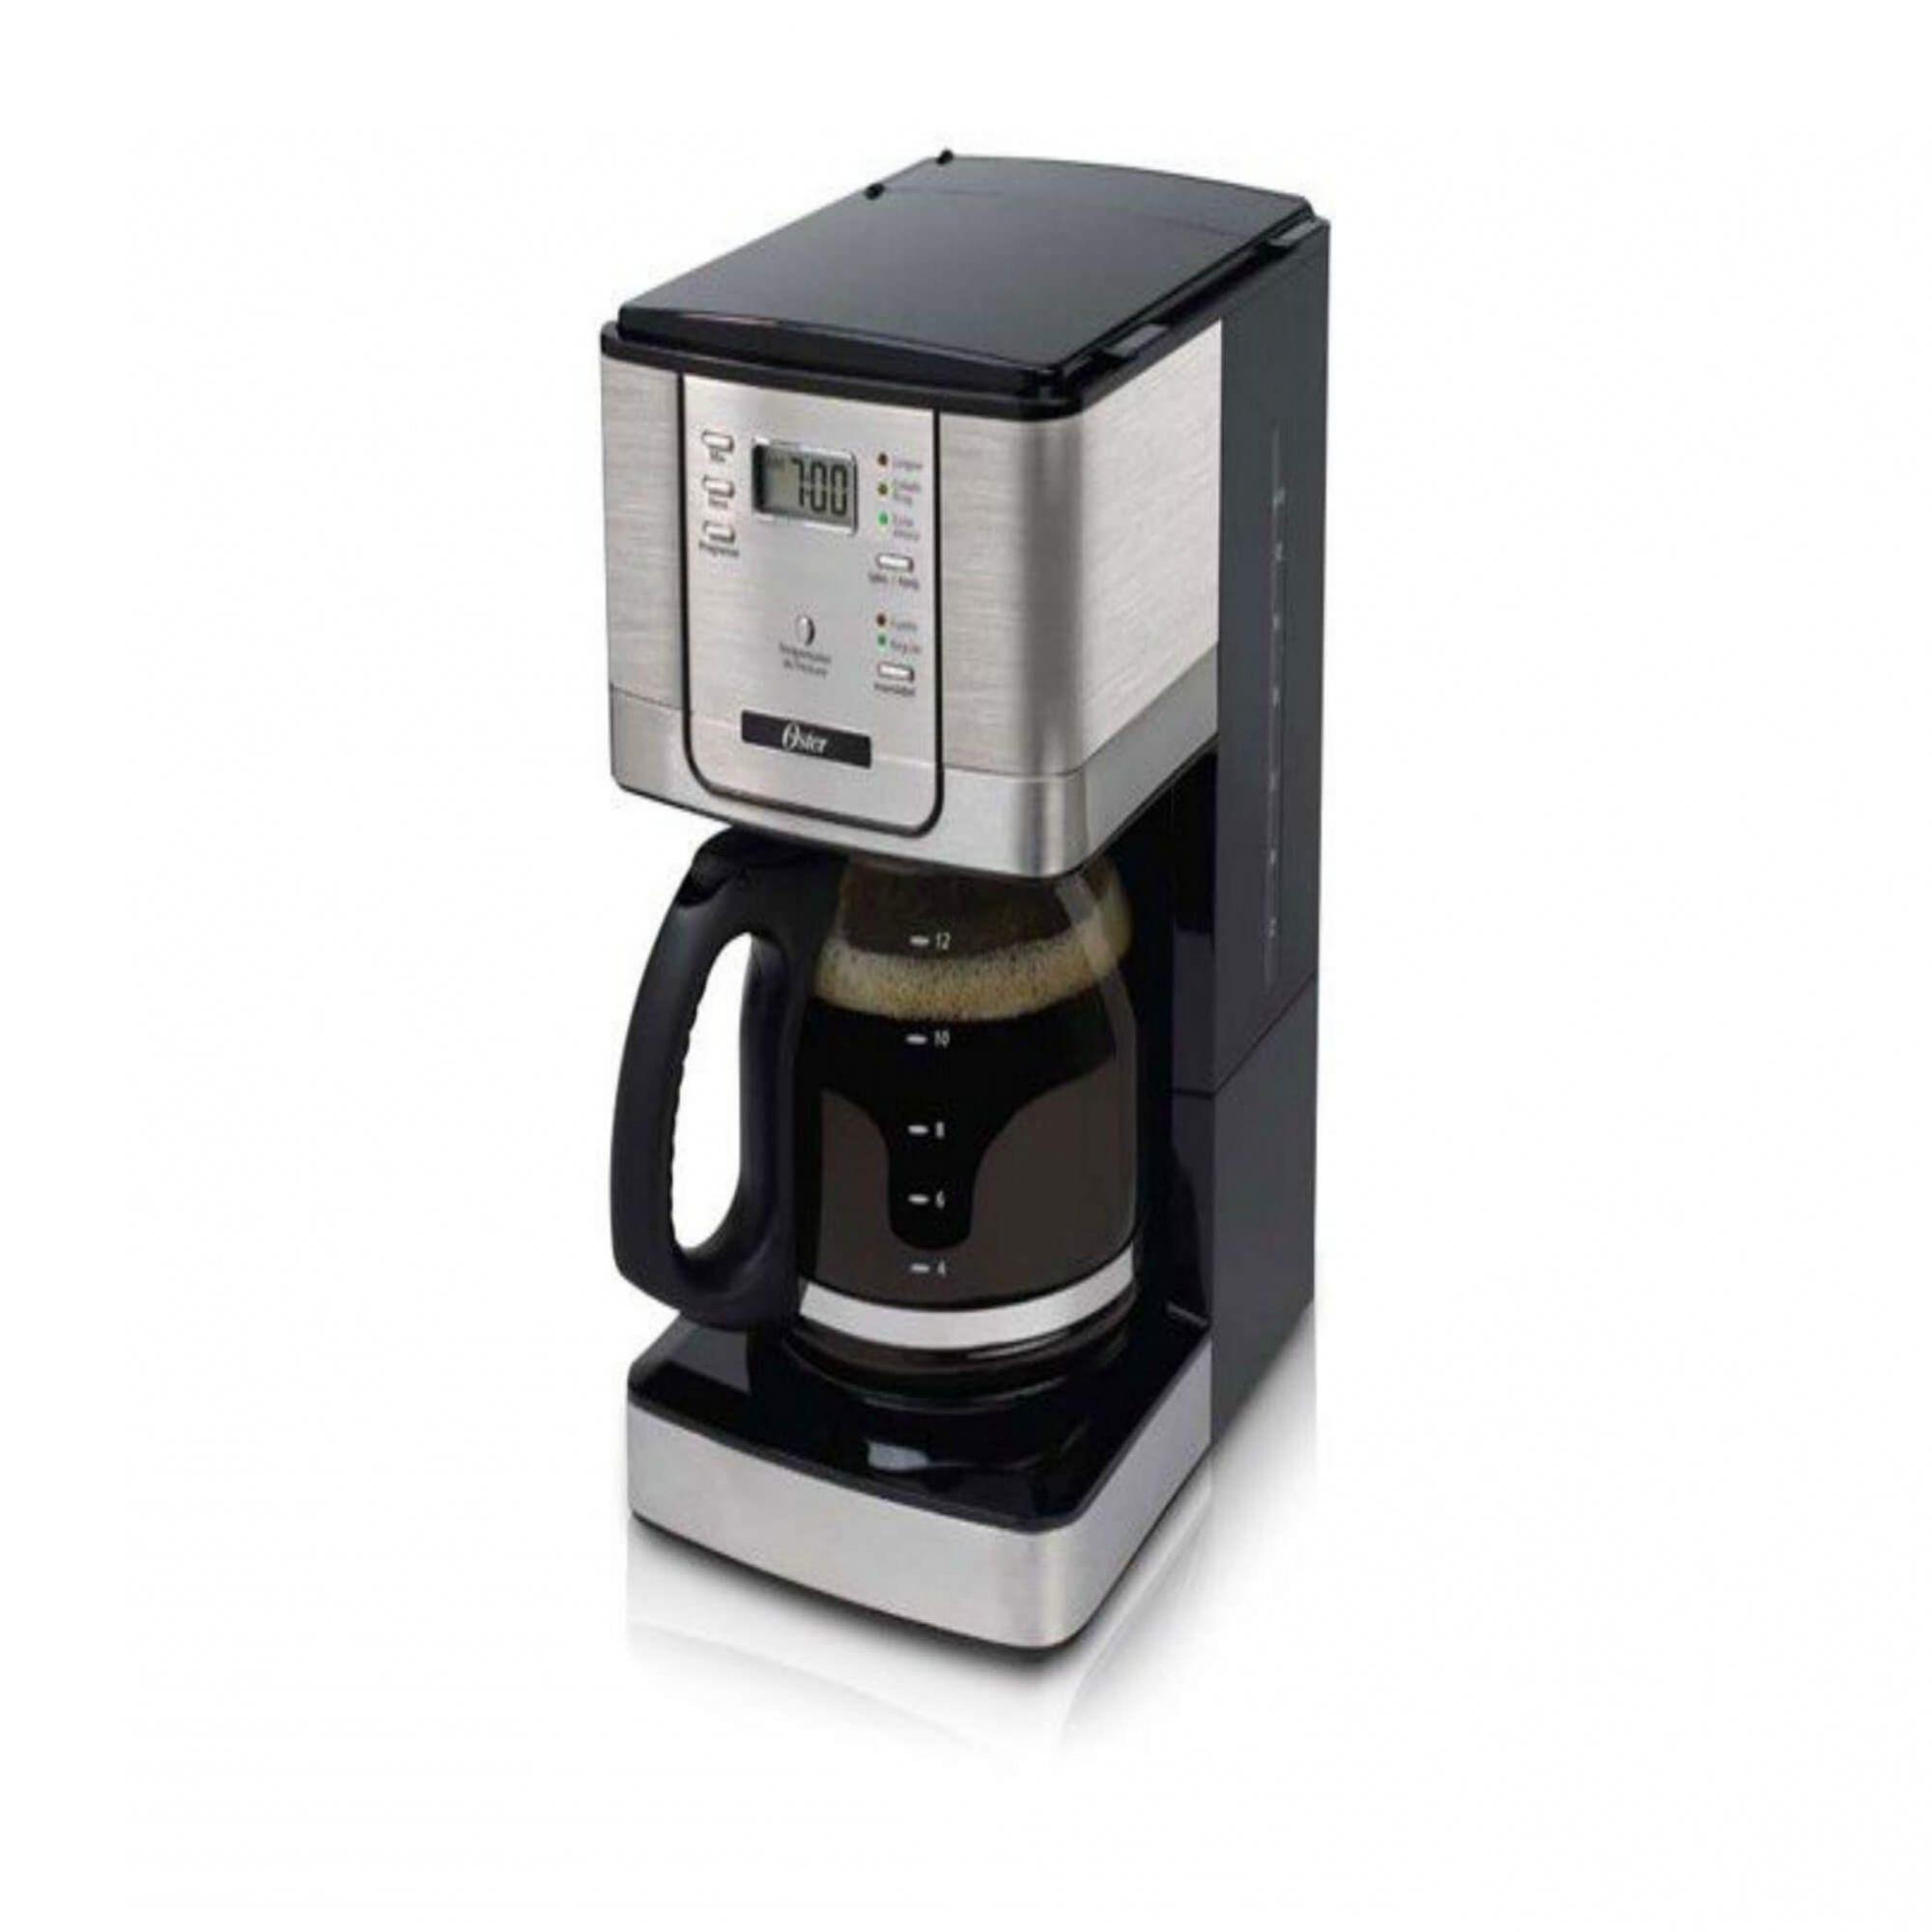 Cafeteira Elétrica Programável  4401 Flavor Prata127v - Oster